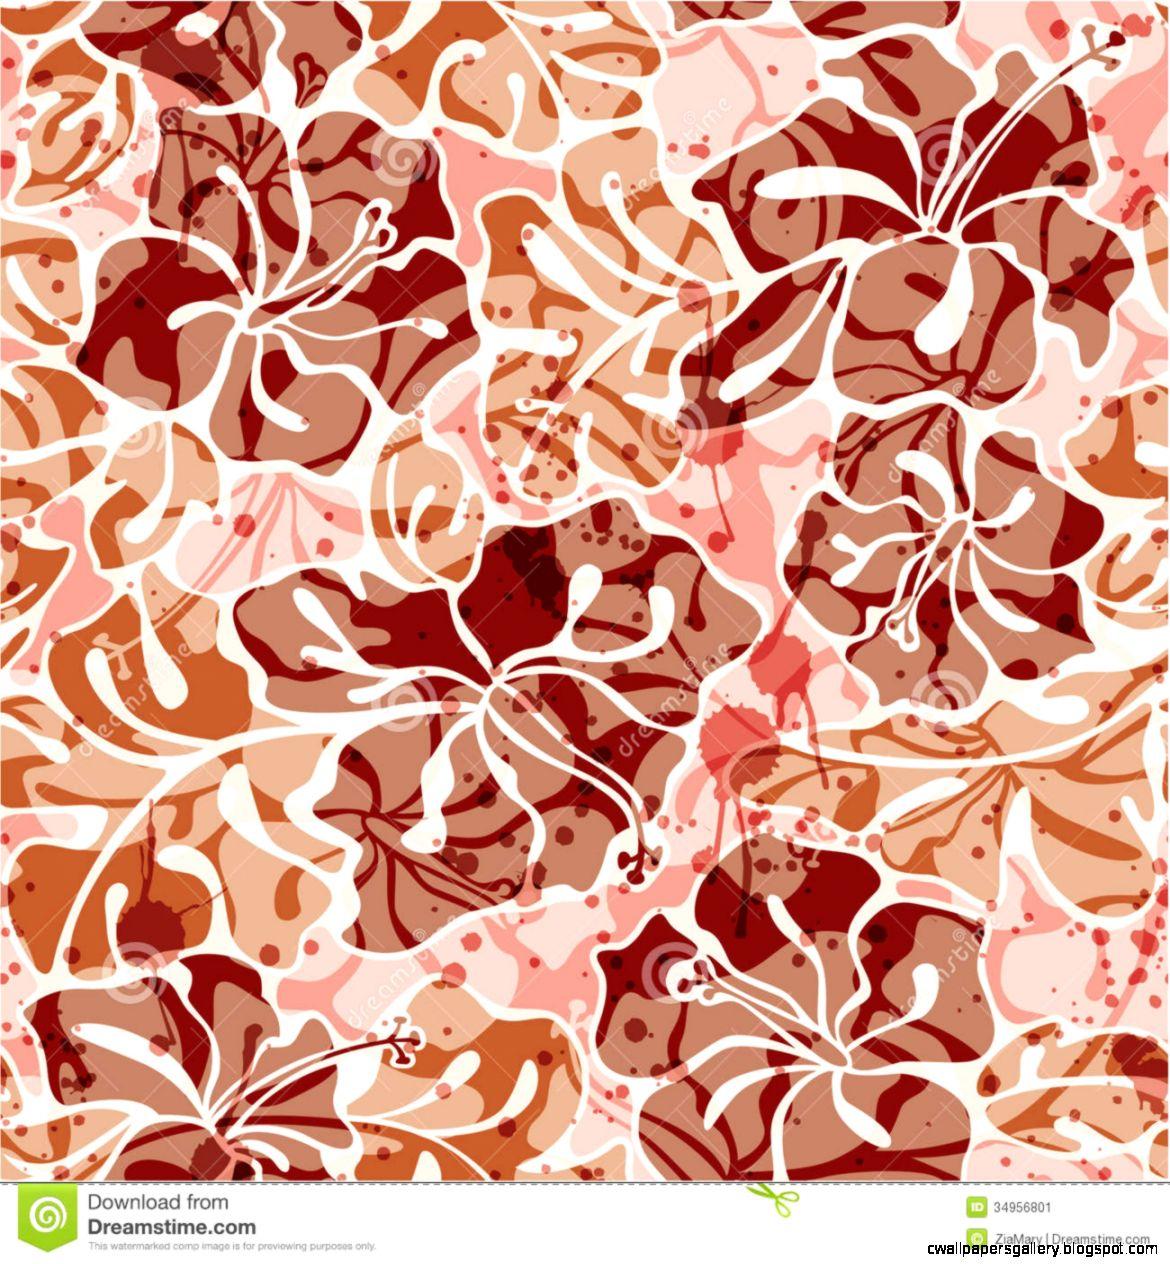 Grunge Hibiscus Flowers Seamless Pattern Stock Image   Image 34956801